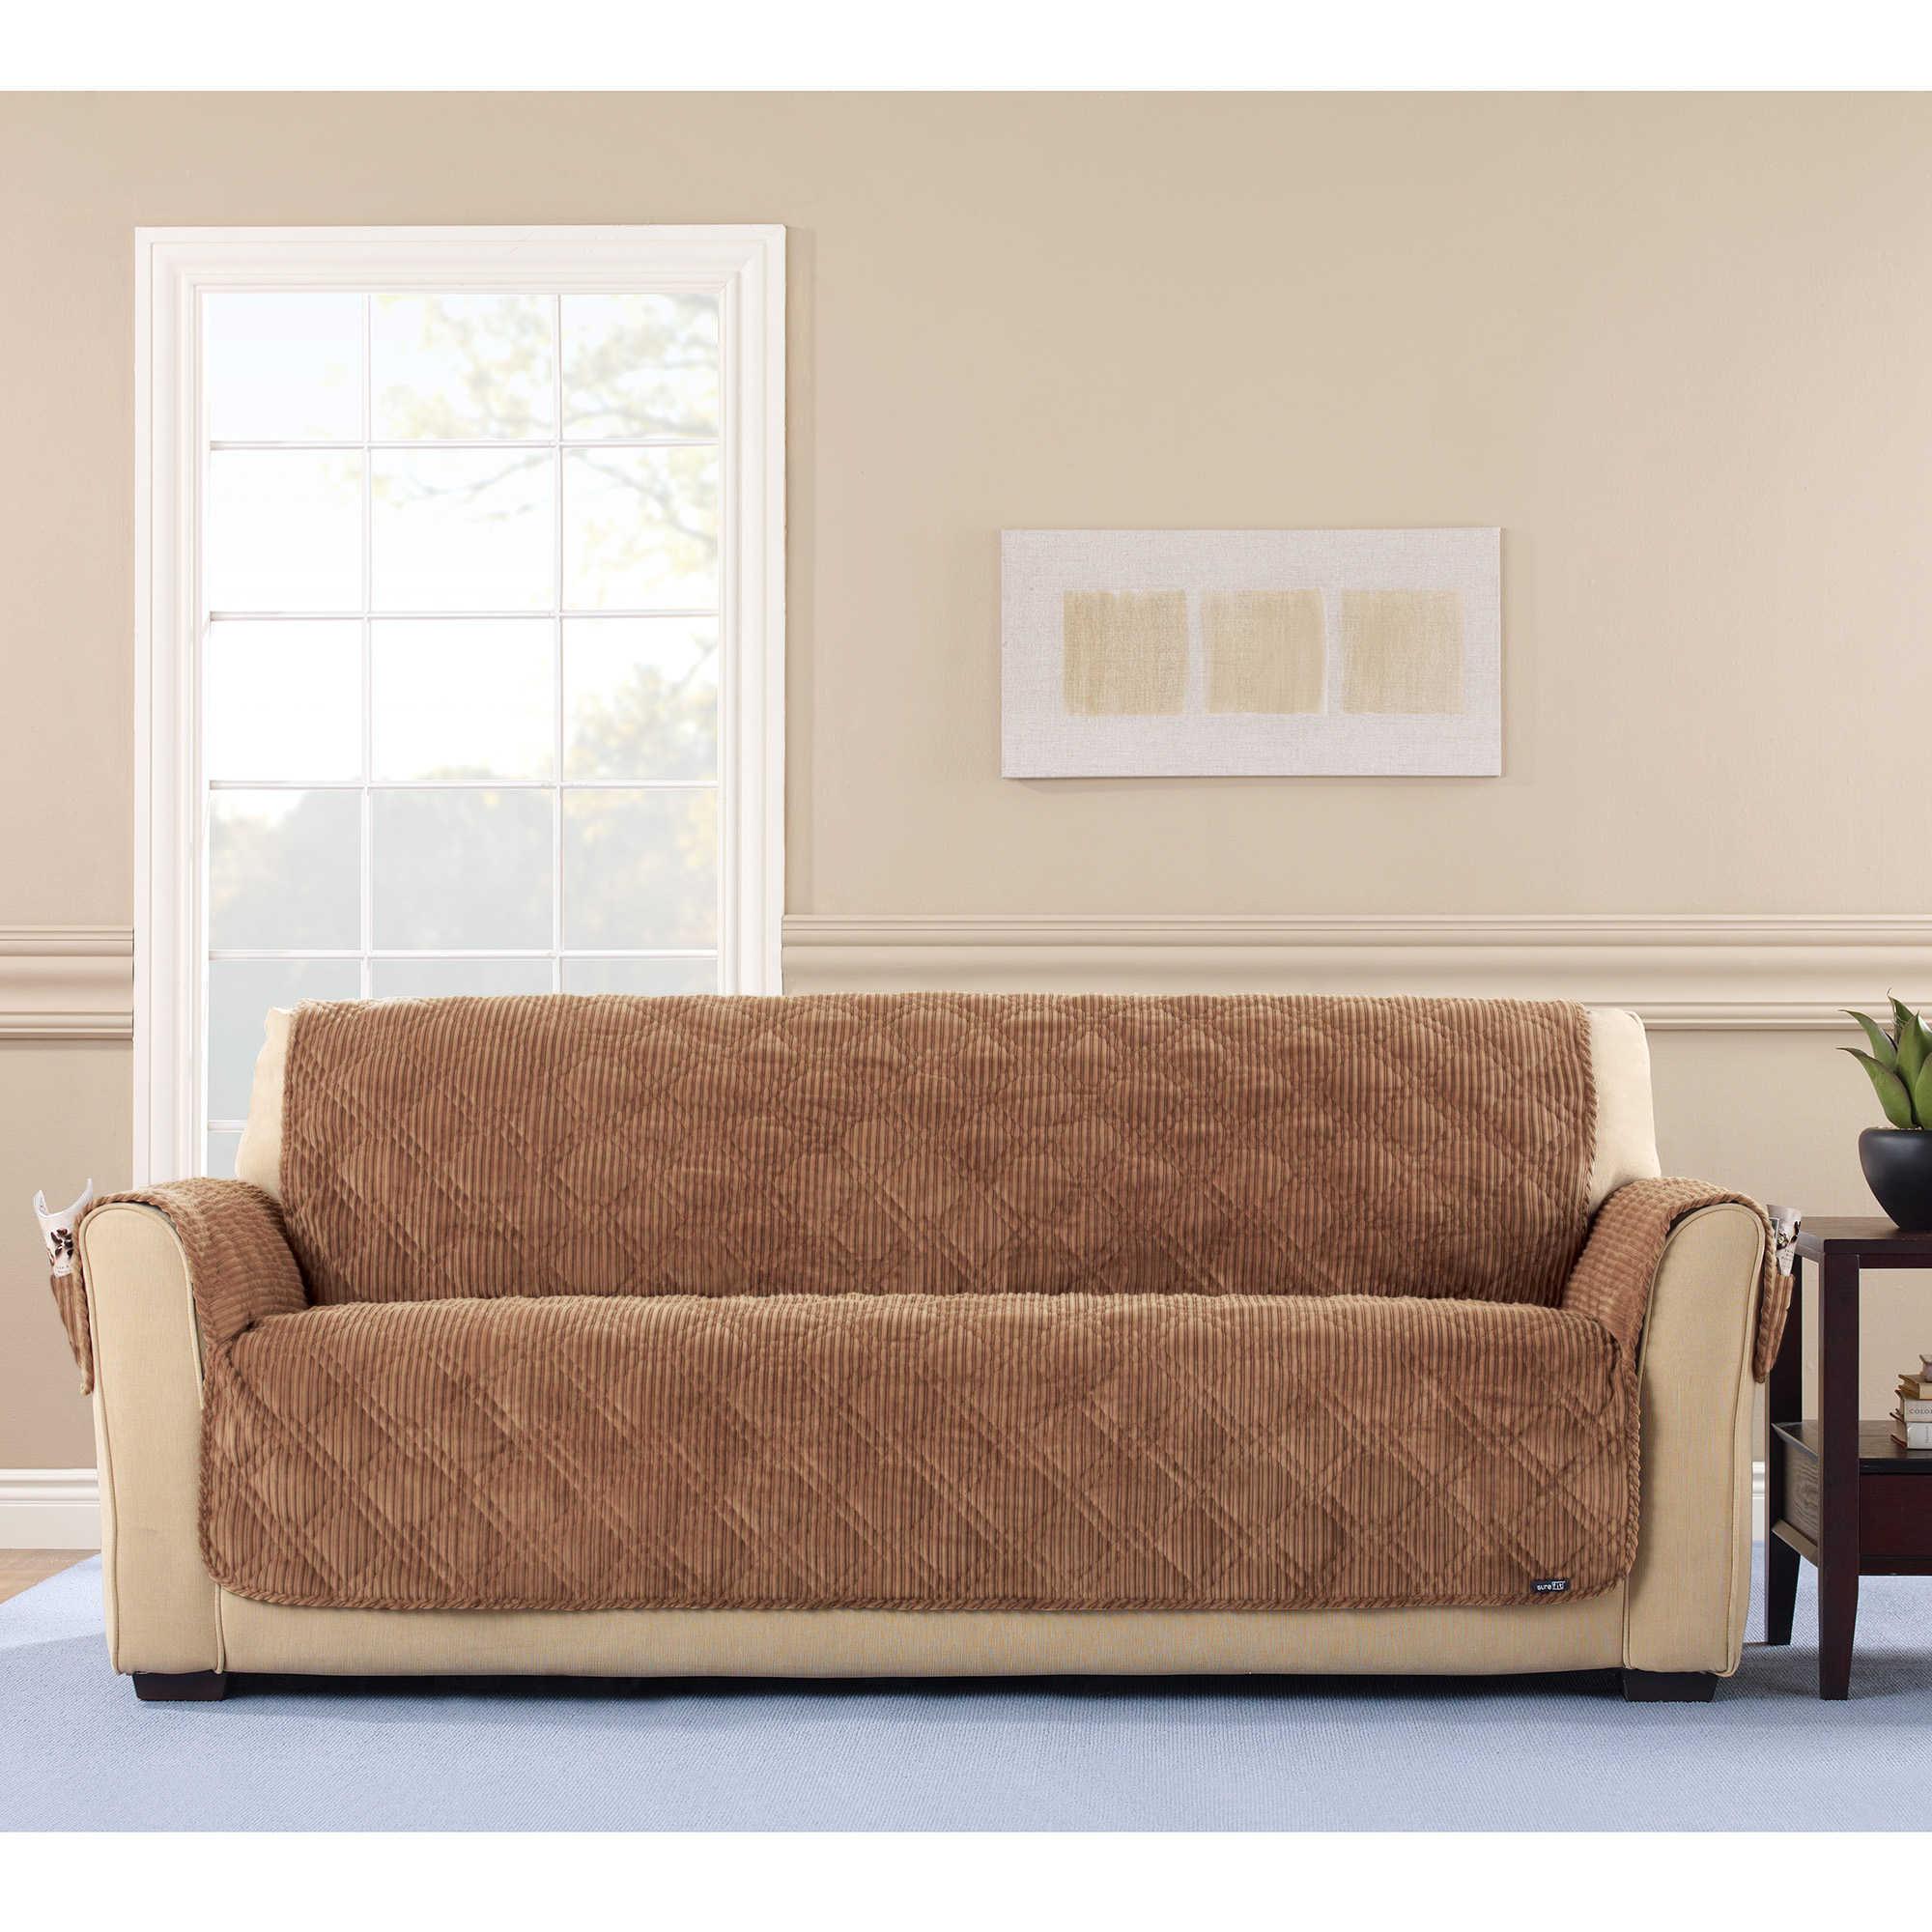 Shop Sure Fit Wide Wale Corduroy Sofa Furniture Protector